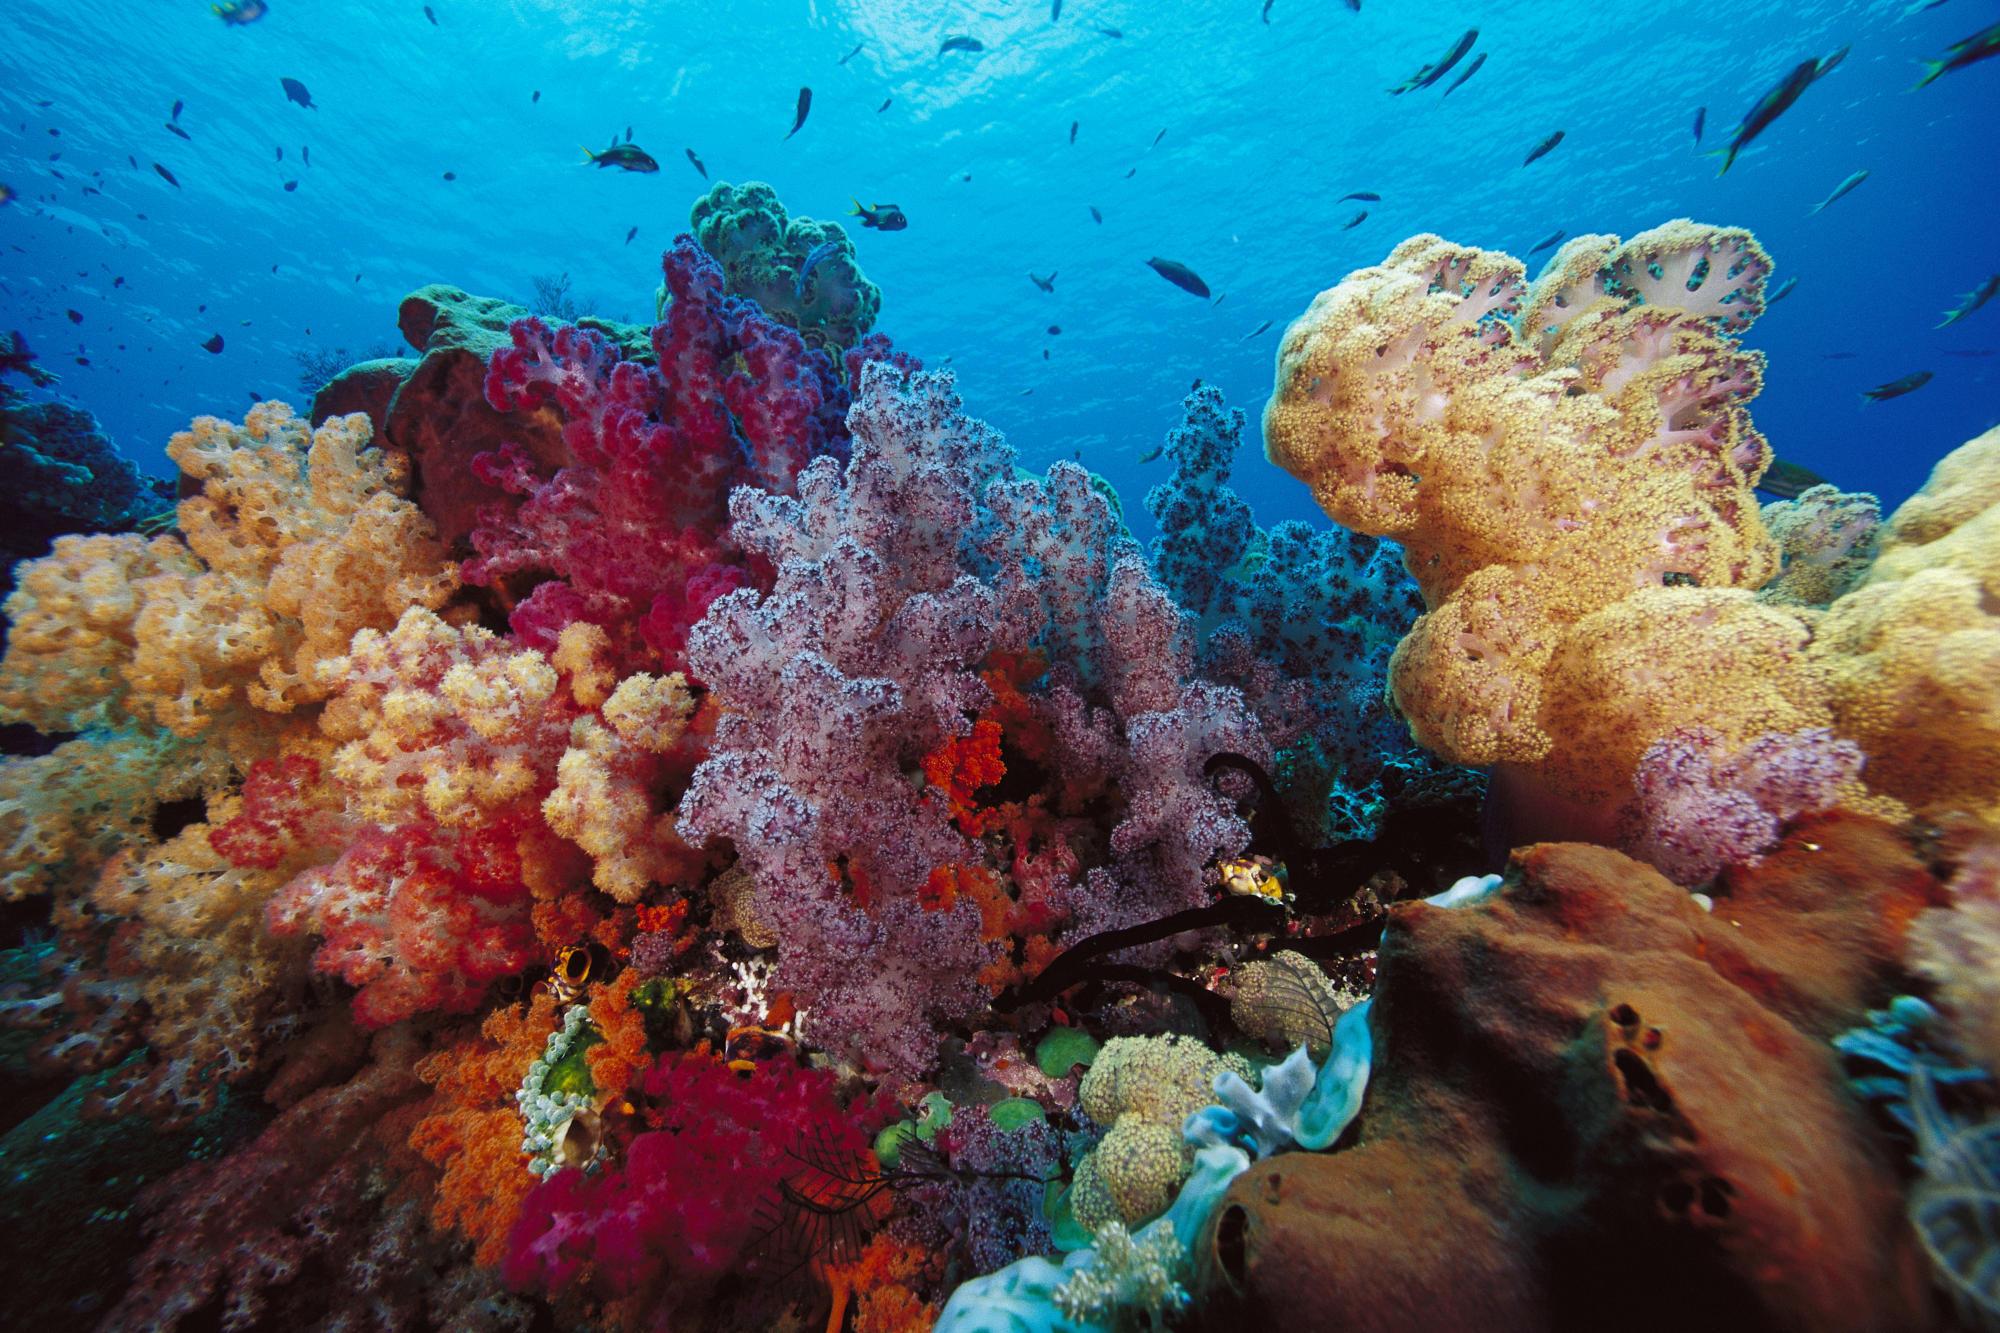 природа рыба море коралловый риф без смс